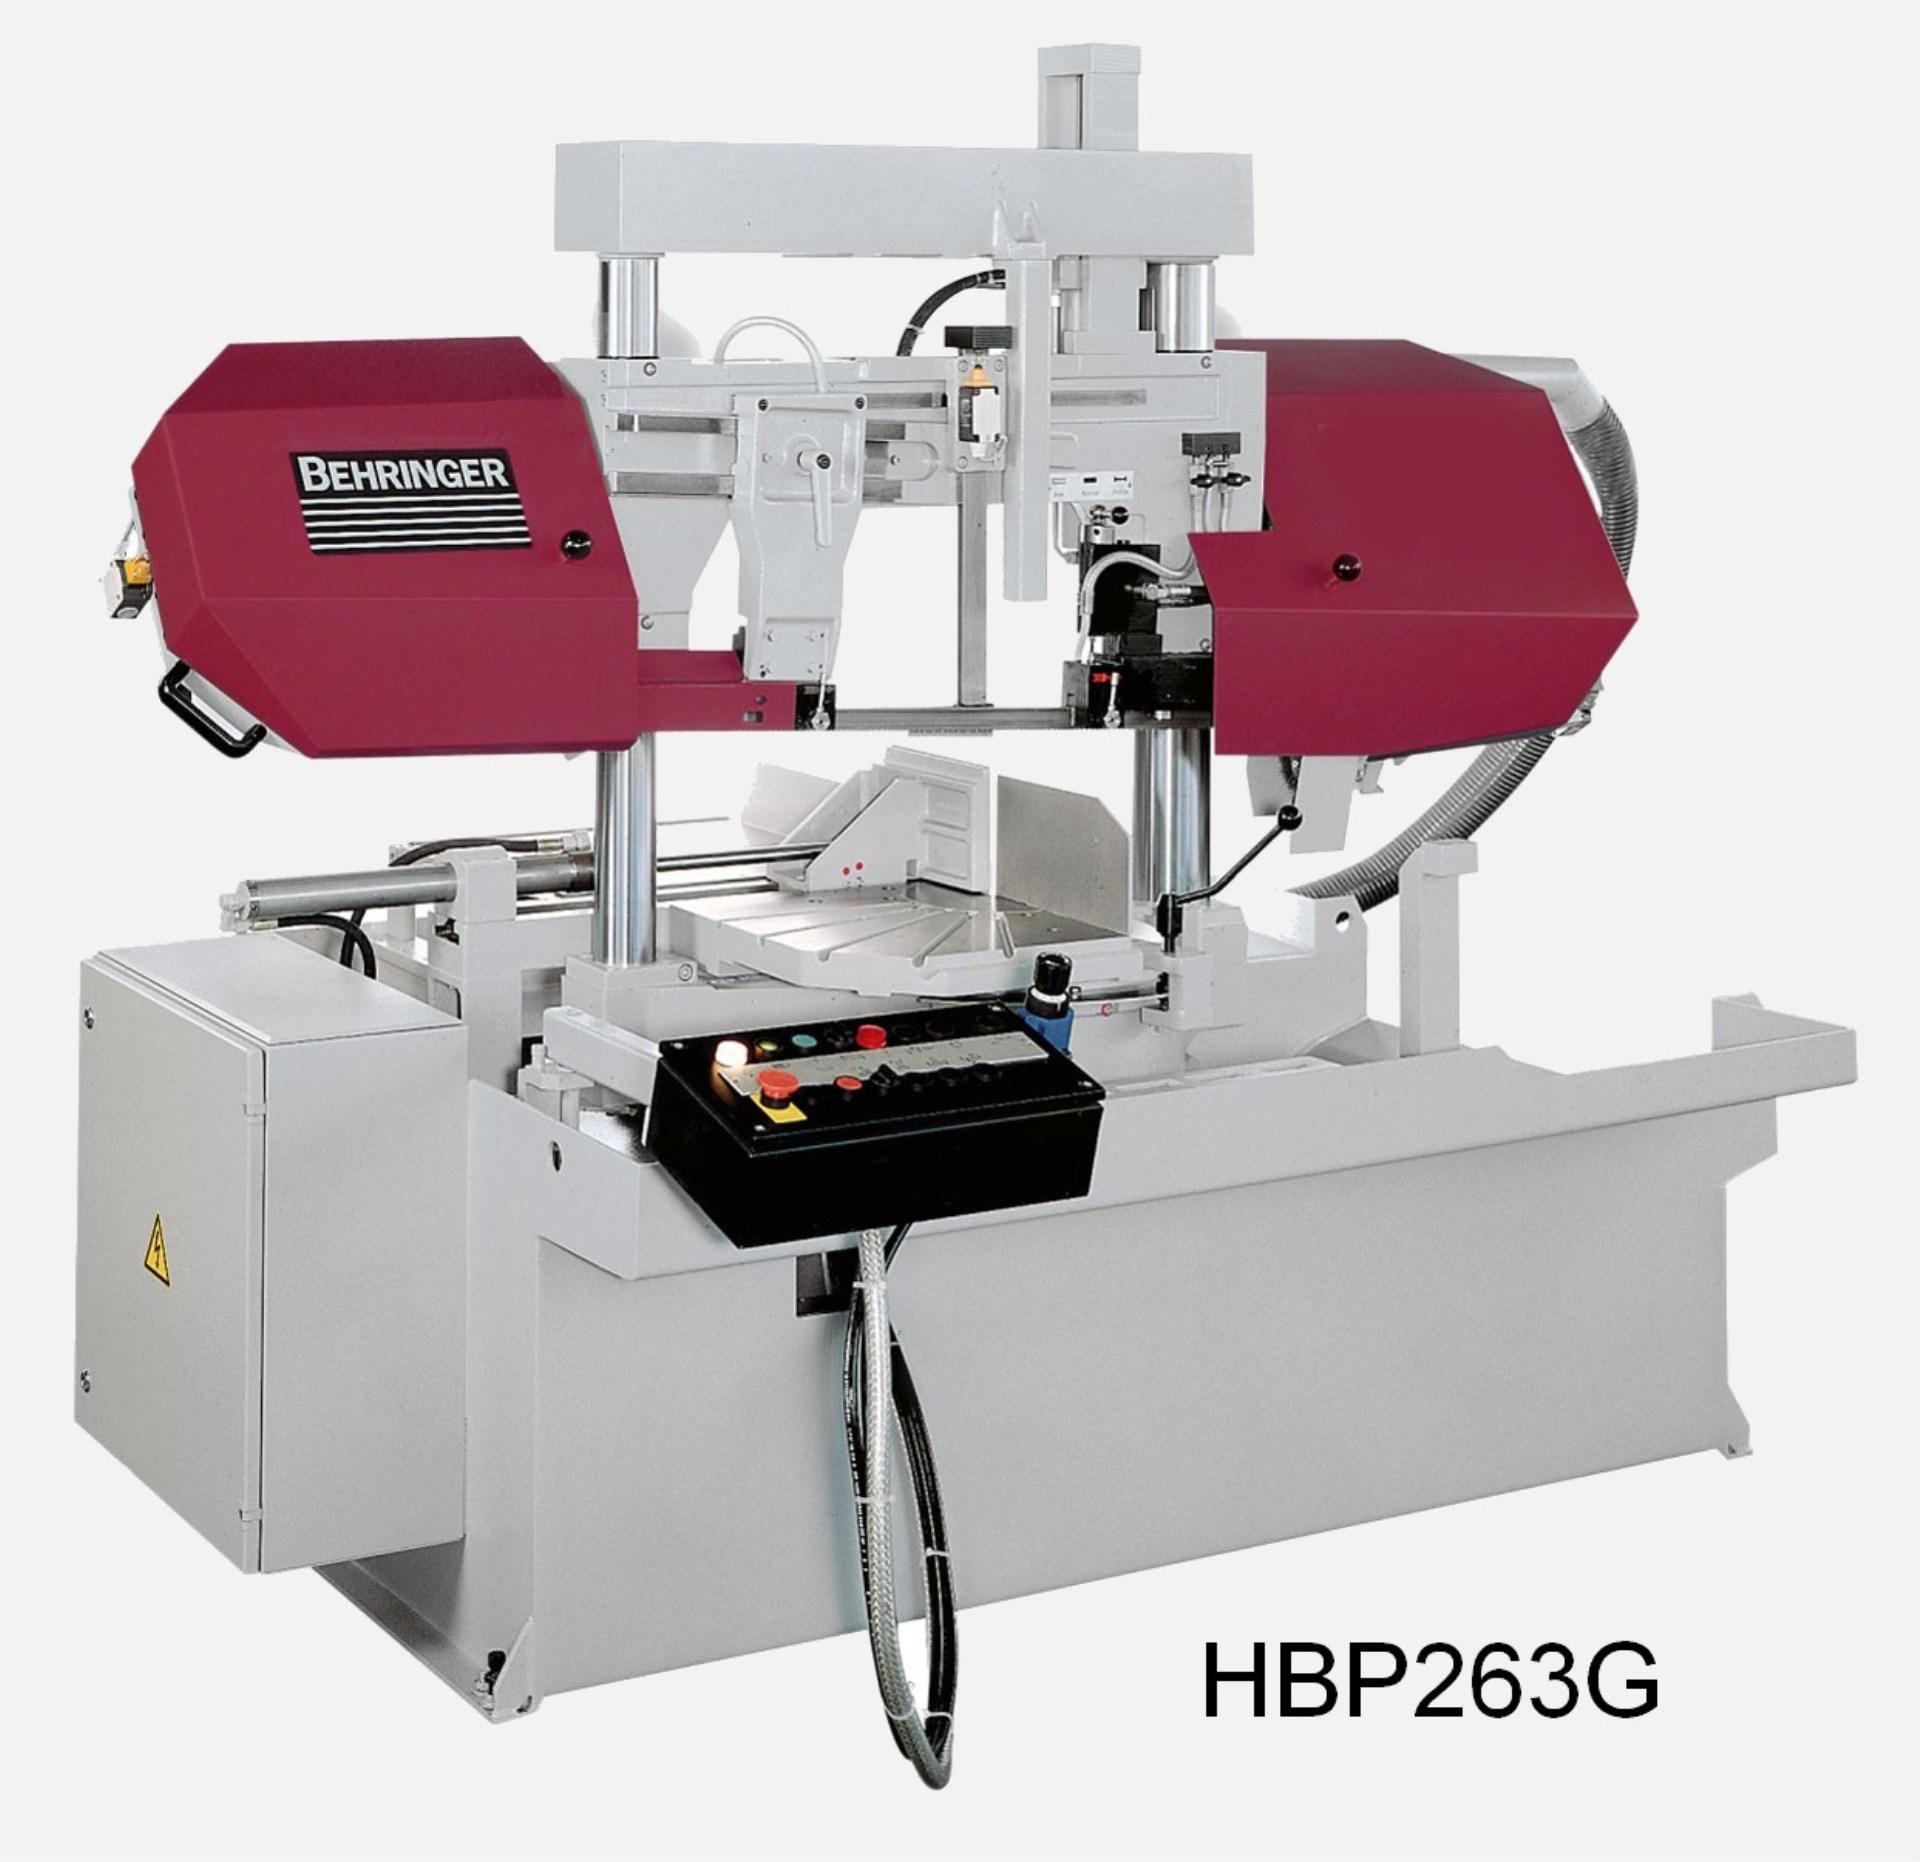 HBP263G